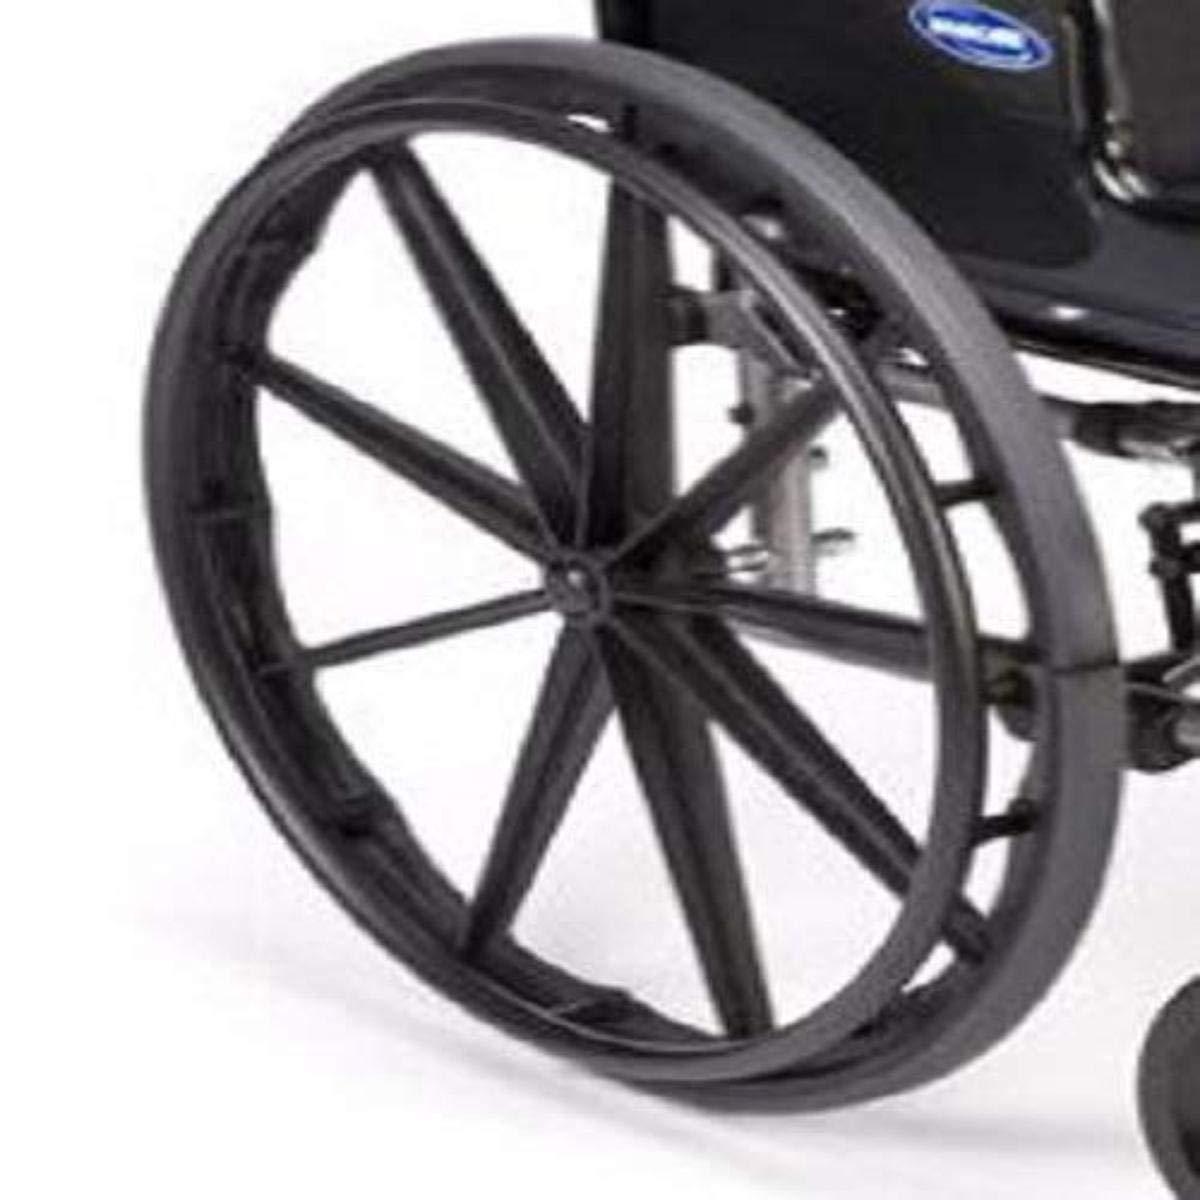 Invacare 1091816 One Arm Drive Wheel Assembly; Chrome Handrim